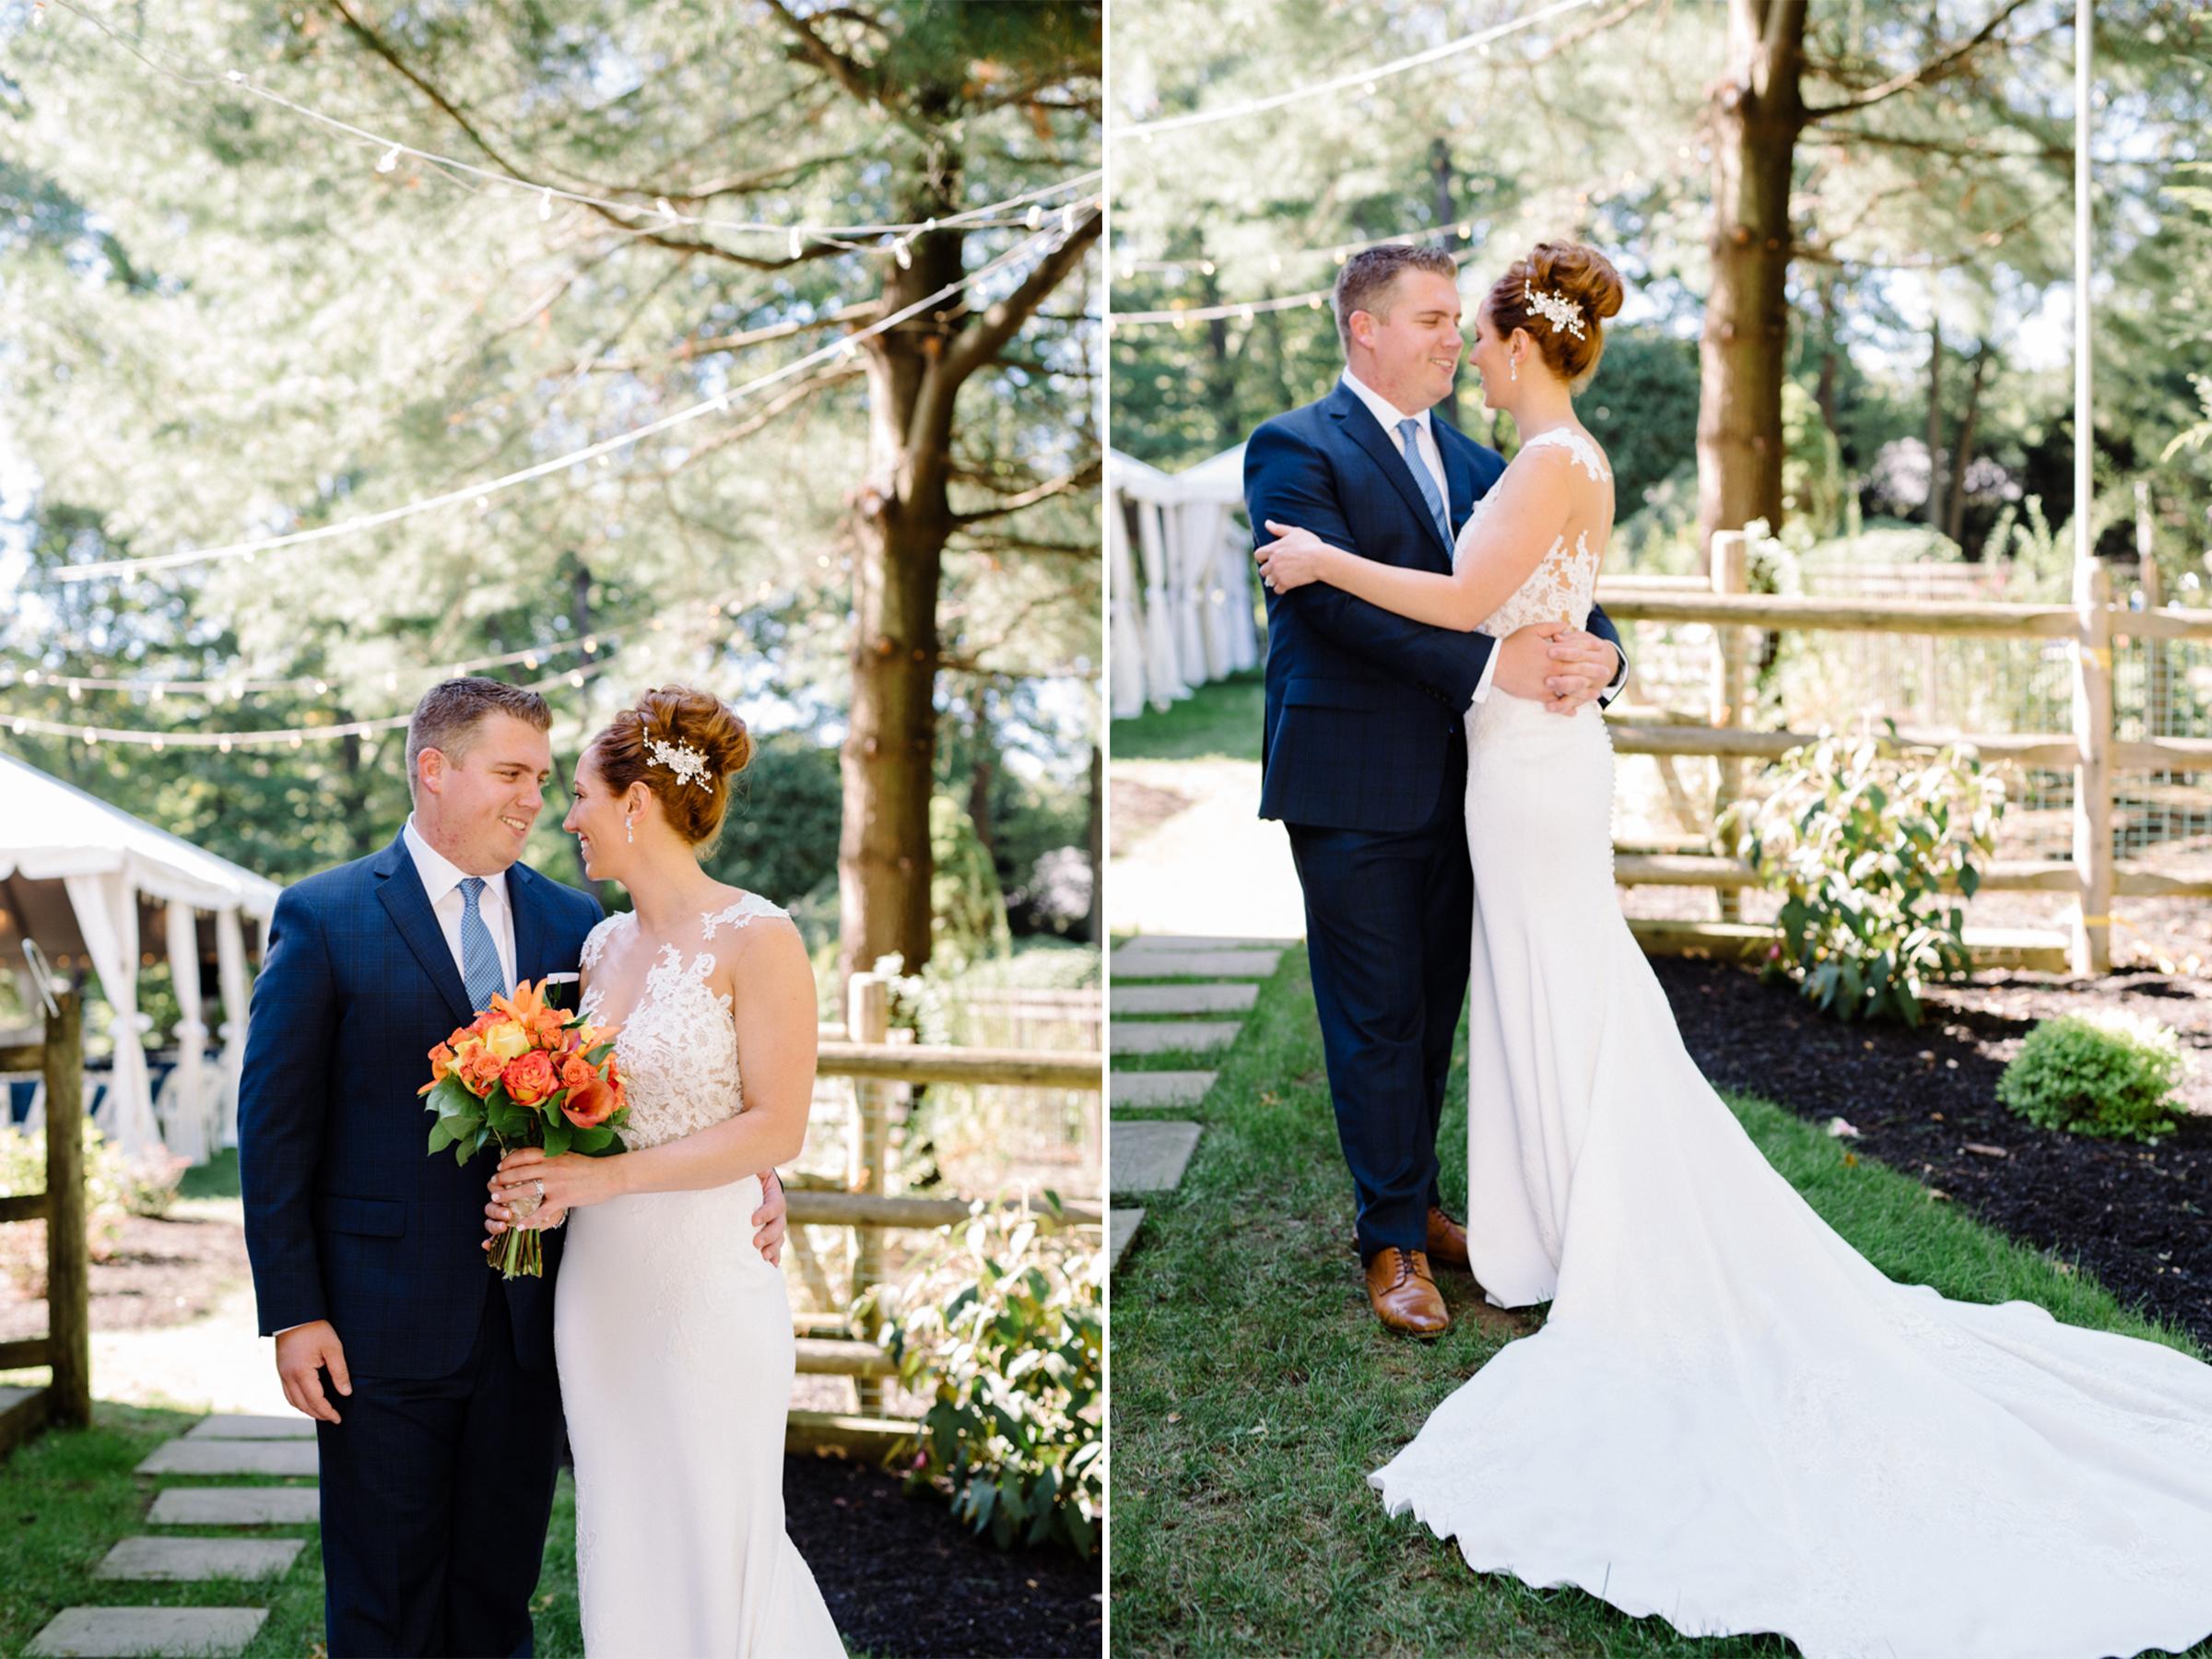 Lauren+AJ- Bride and Groom Portraits- DIY Backyard Wedding- New Jersey- Olivia Christina Photo.jpg